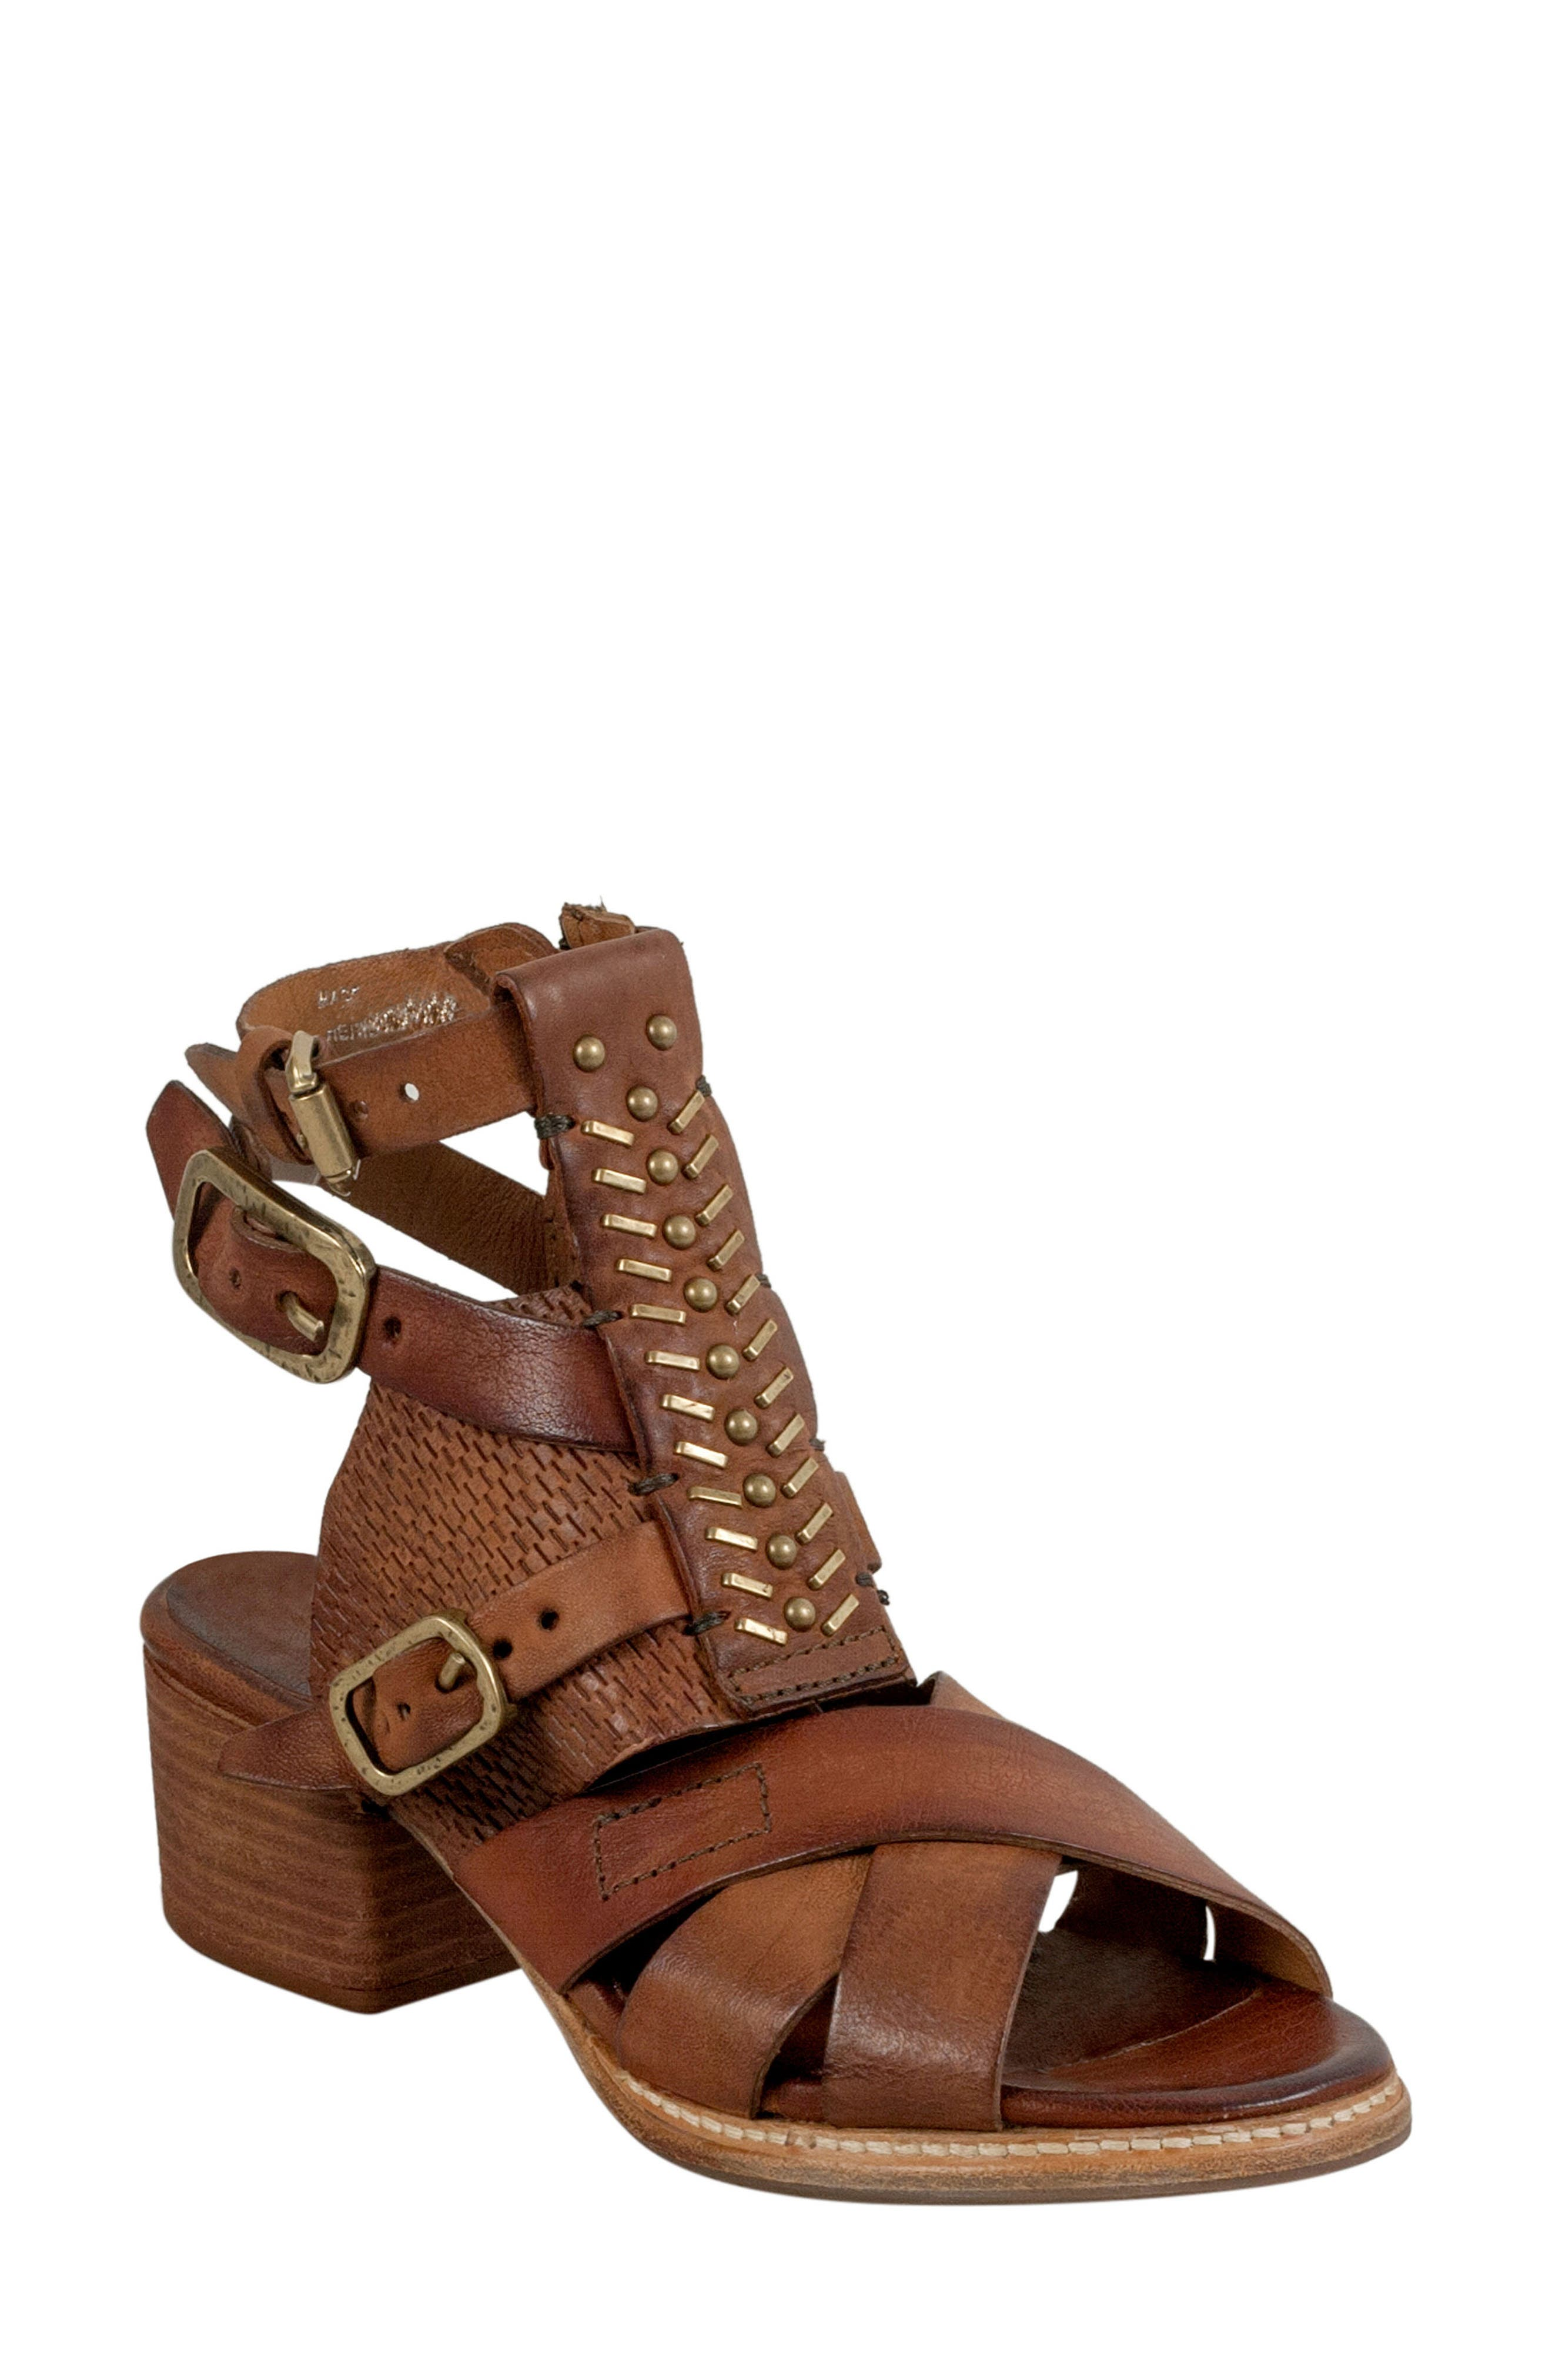 A.S.98 Pennie Gladiator Sandal, Cognac